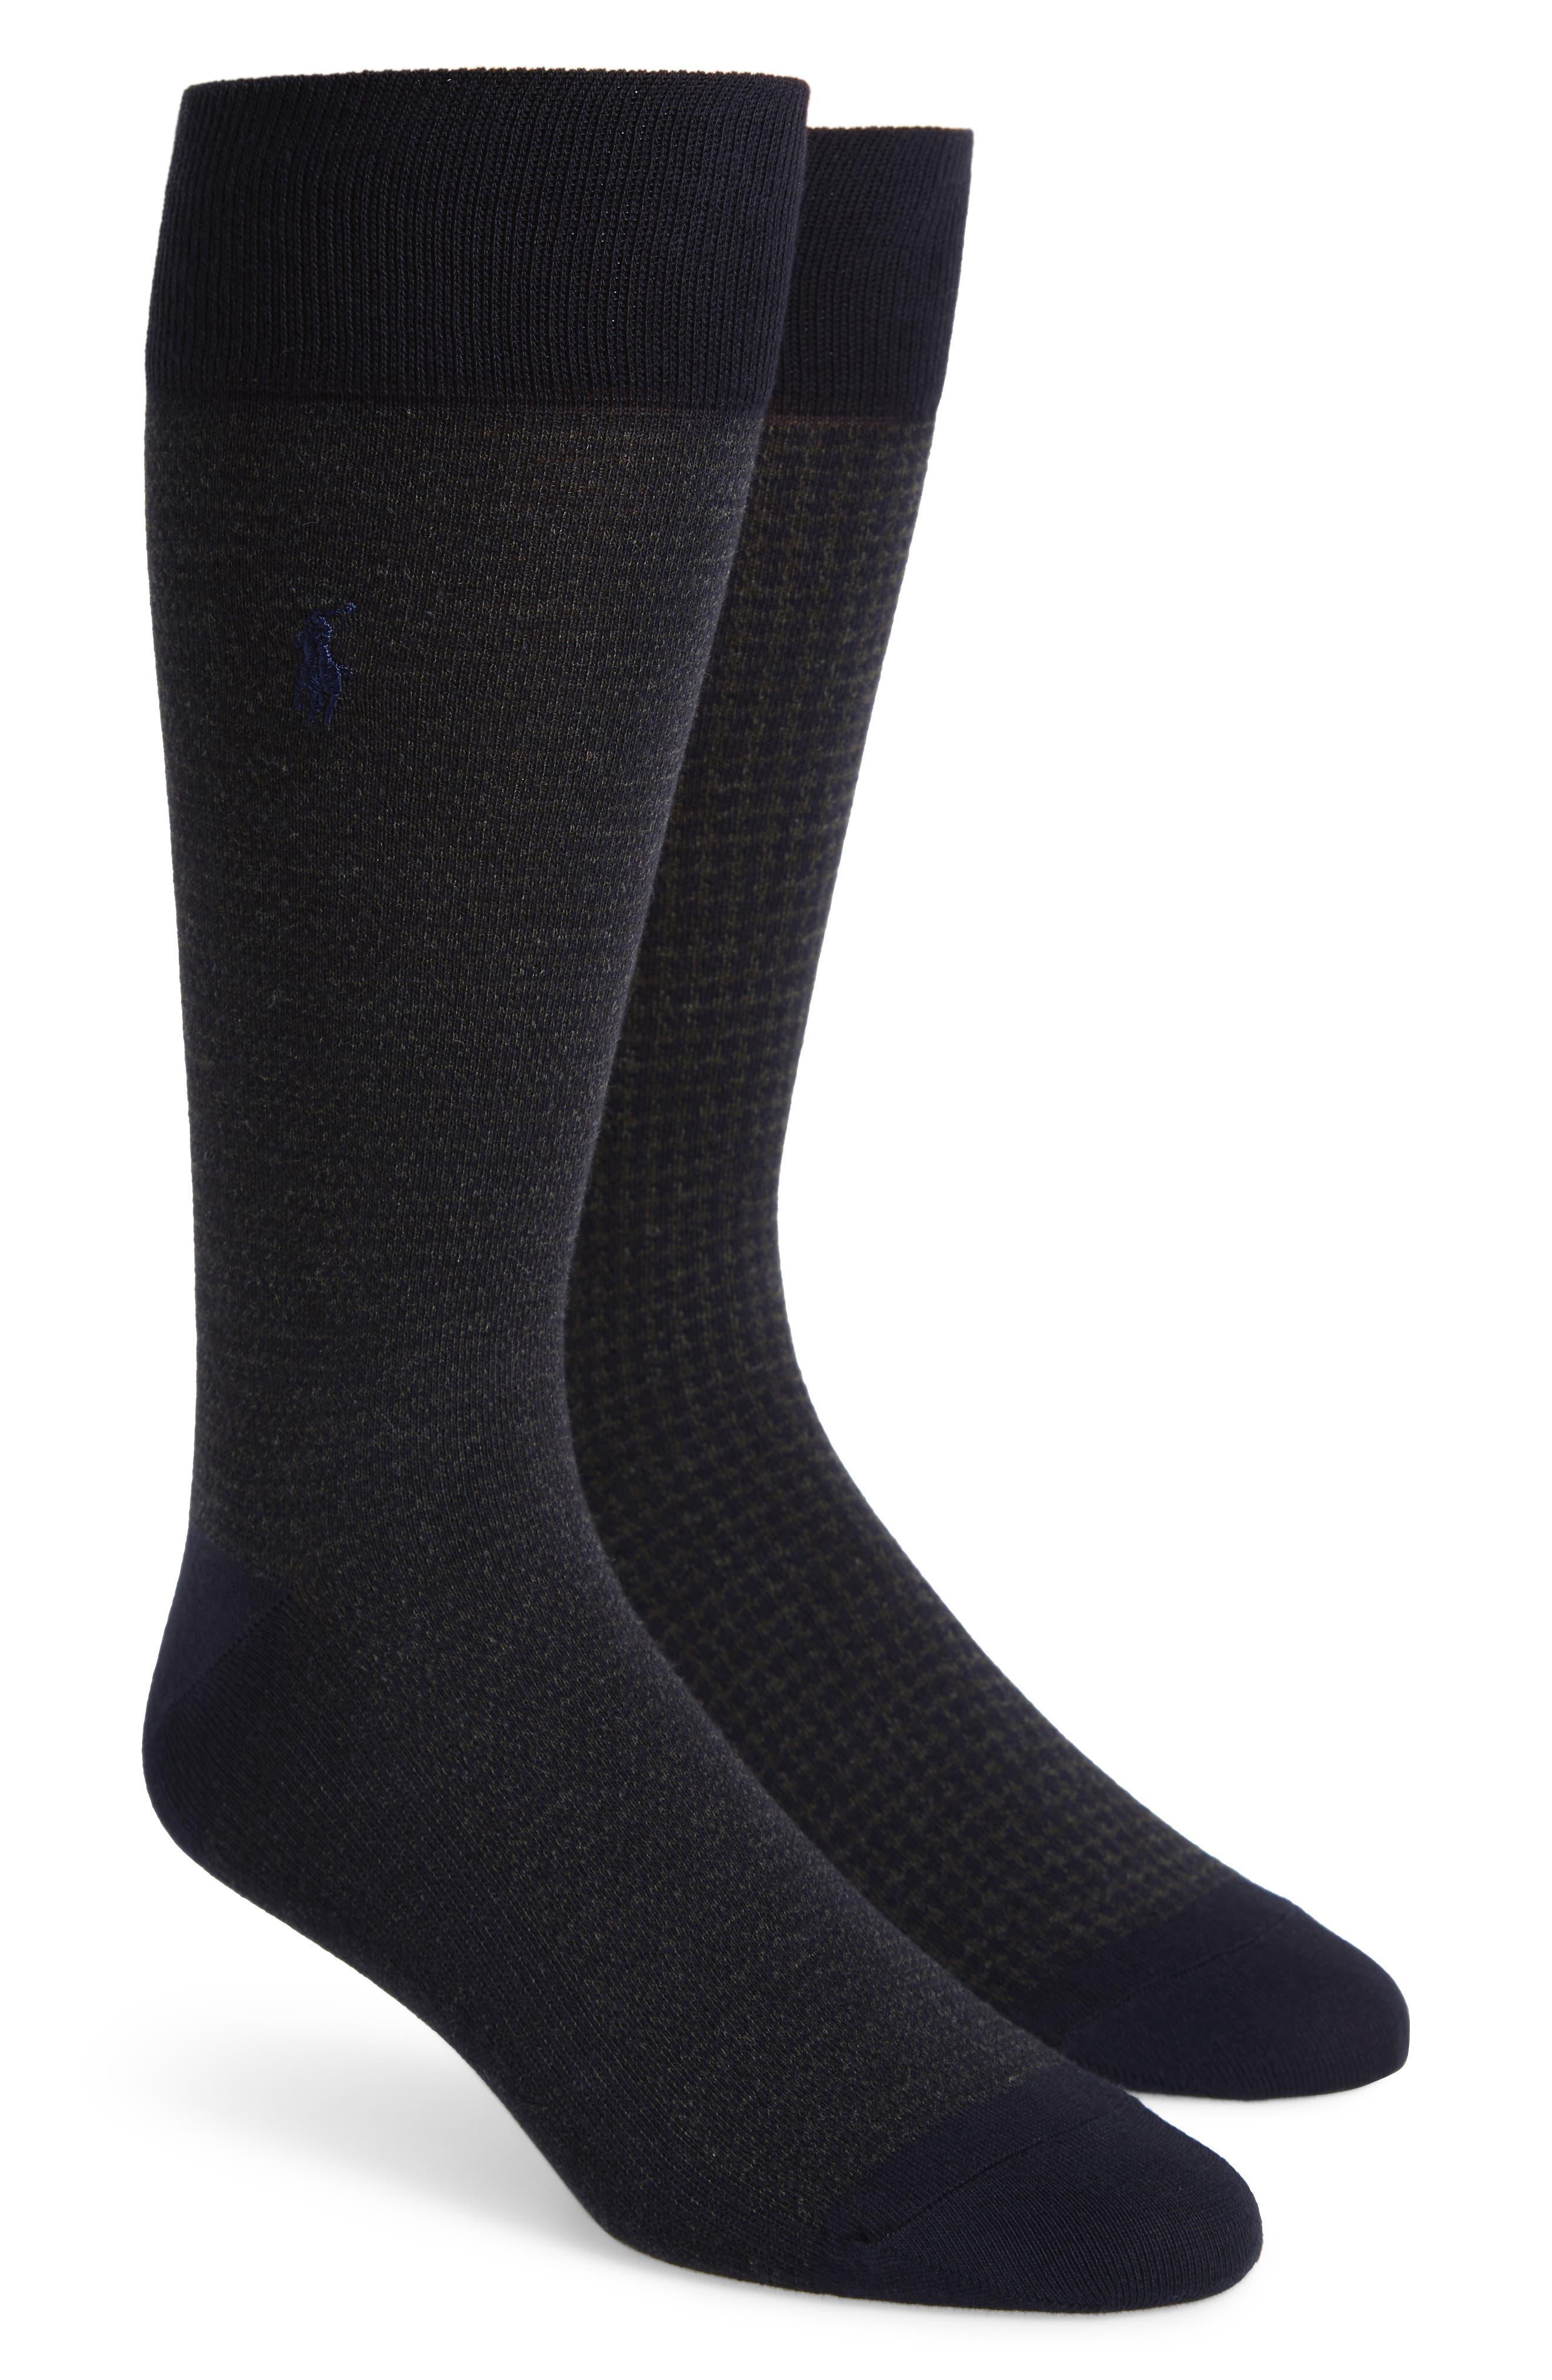 Polo Ralph Lauren 2-Pack Assorted Houndstooth Dress Socks